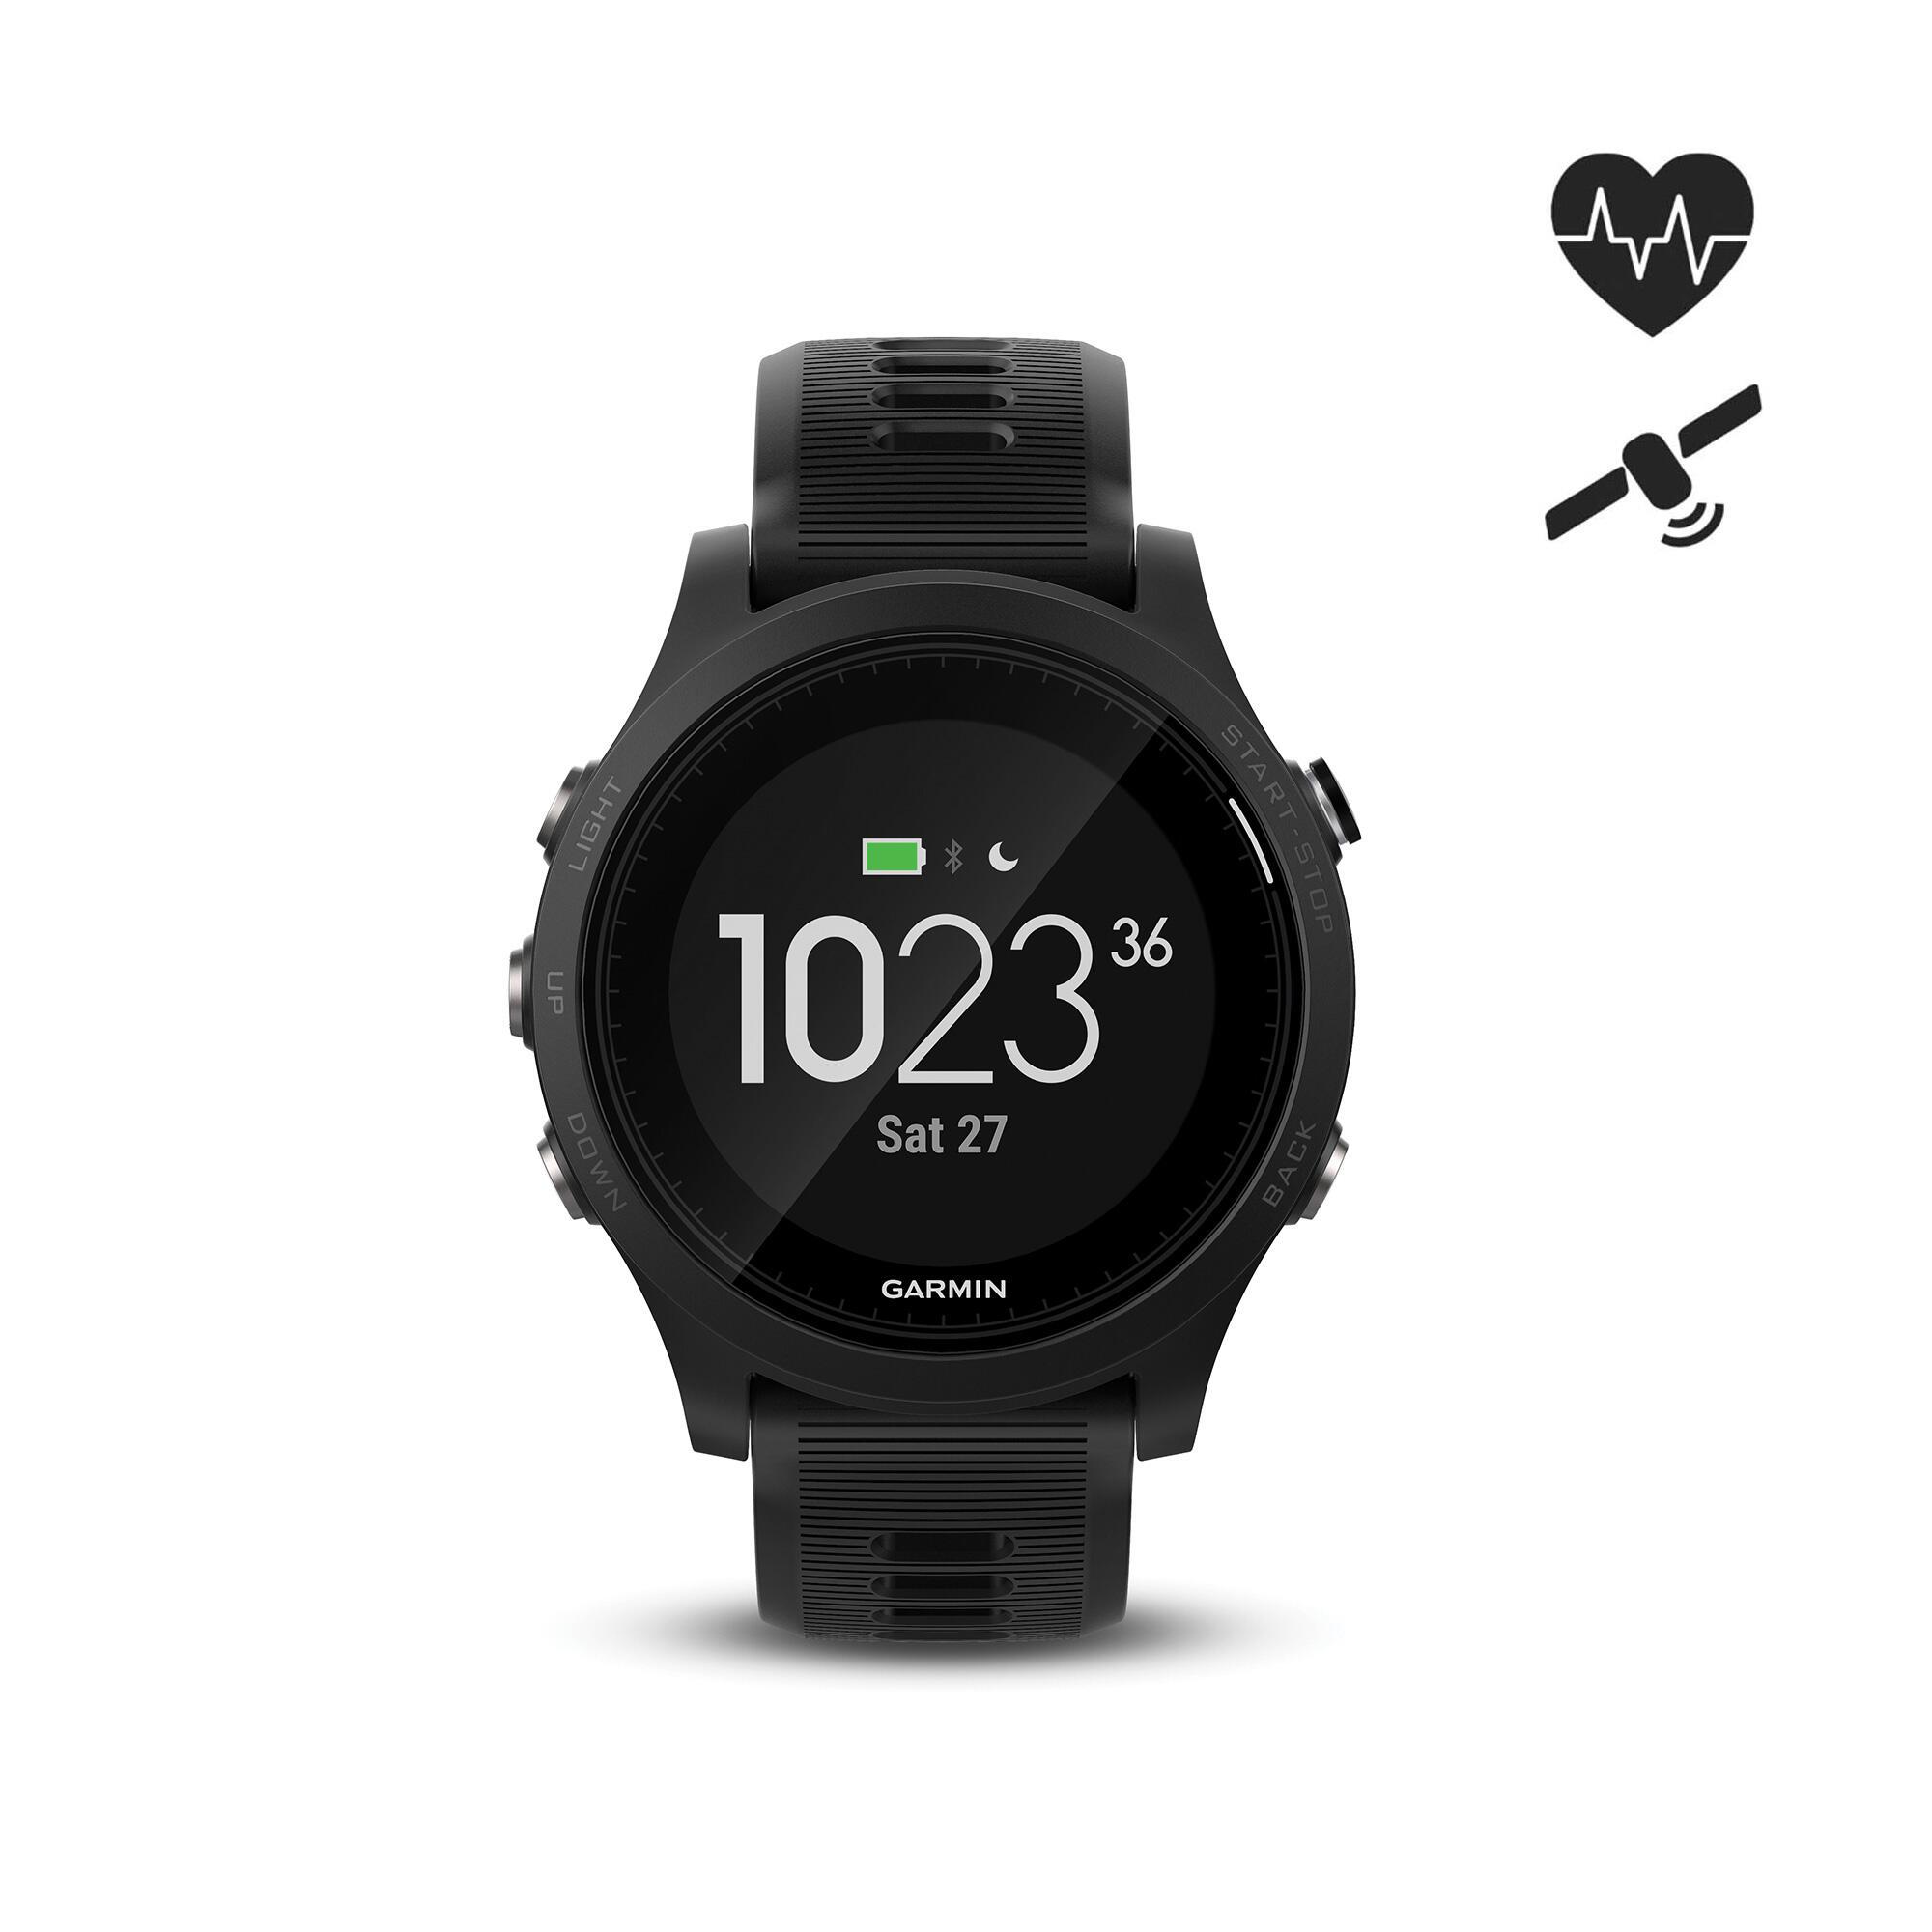 d97c1cc51bf7 Comprar Relojes Gps Deportivos online